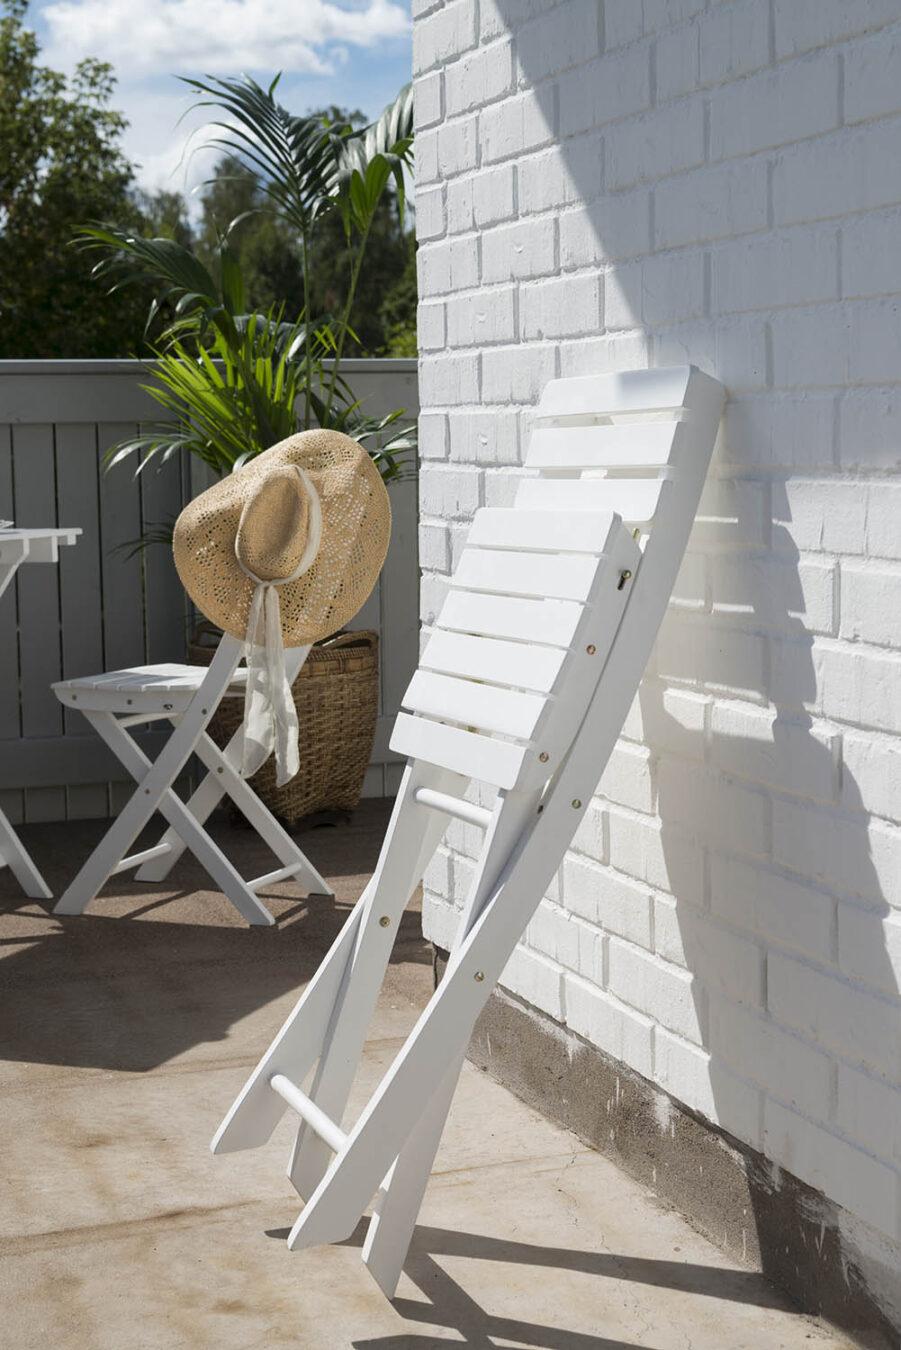 Fällbar stol i vit hardwood från levereantören Hillerstorp.